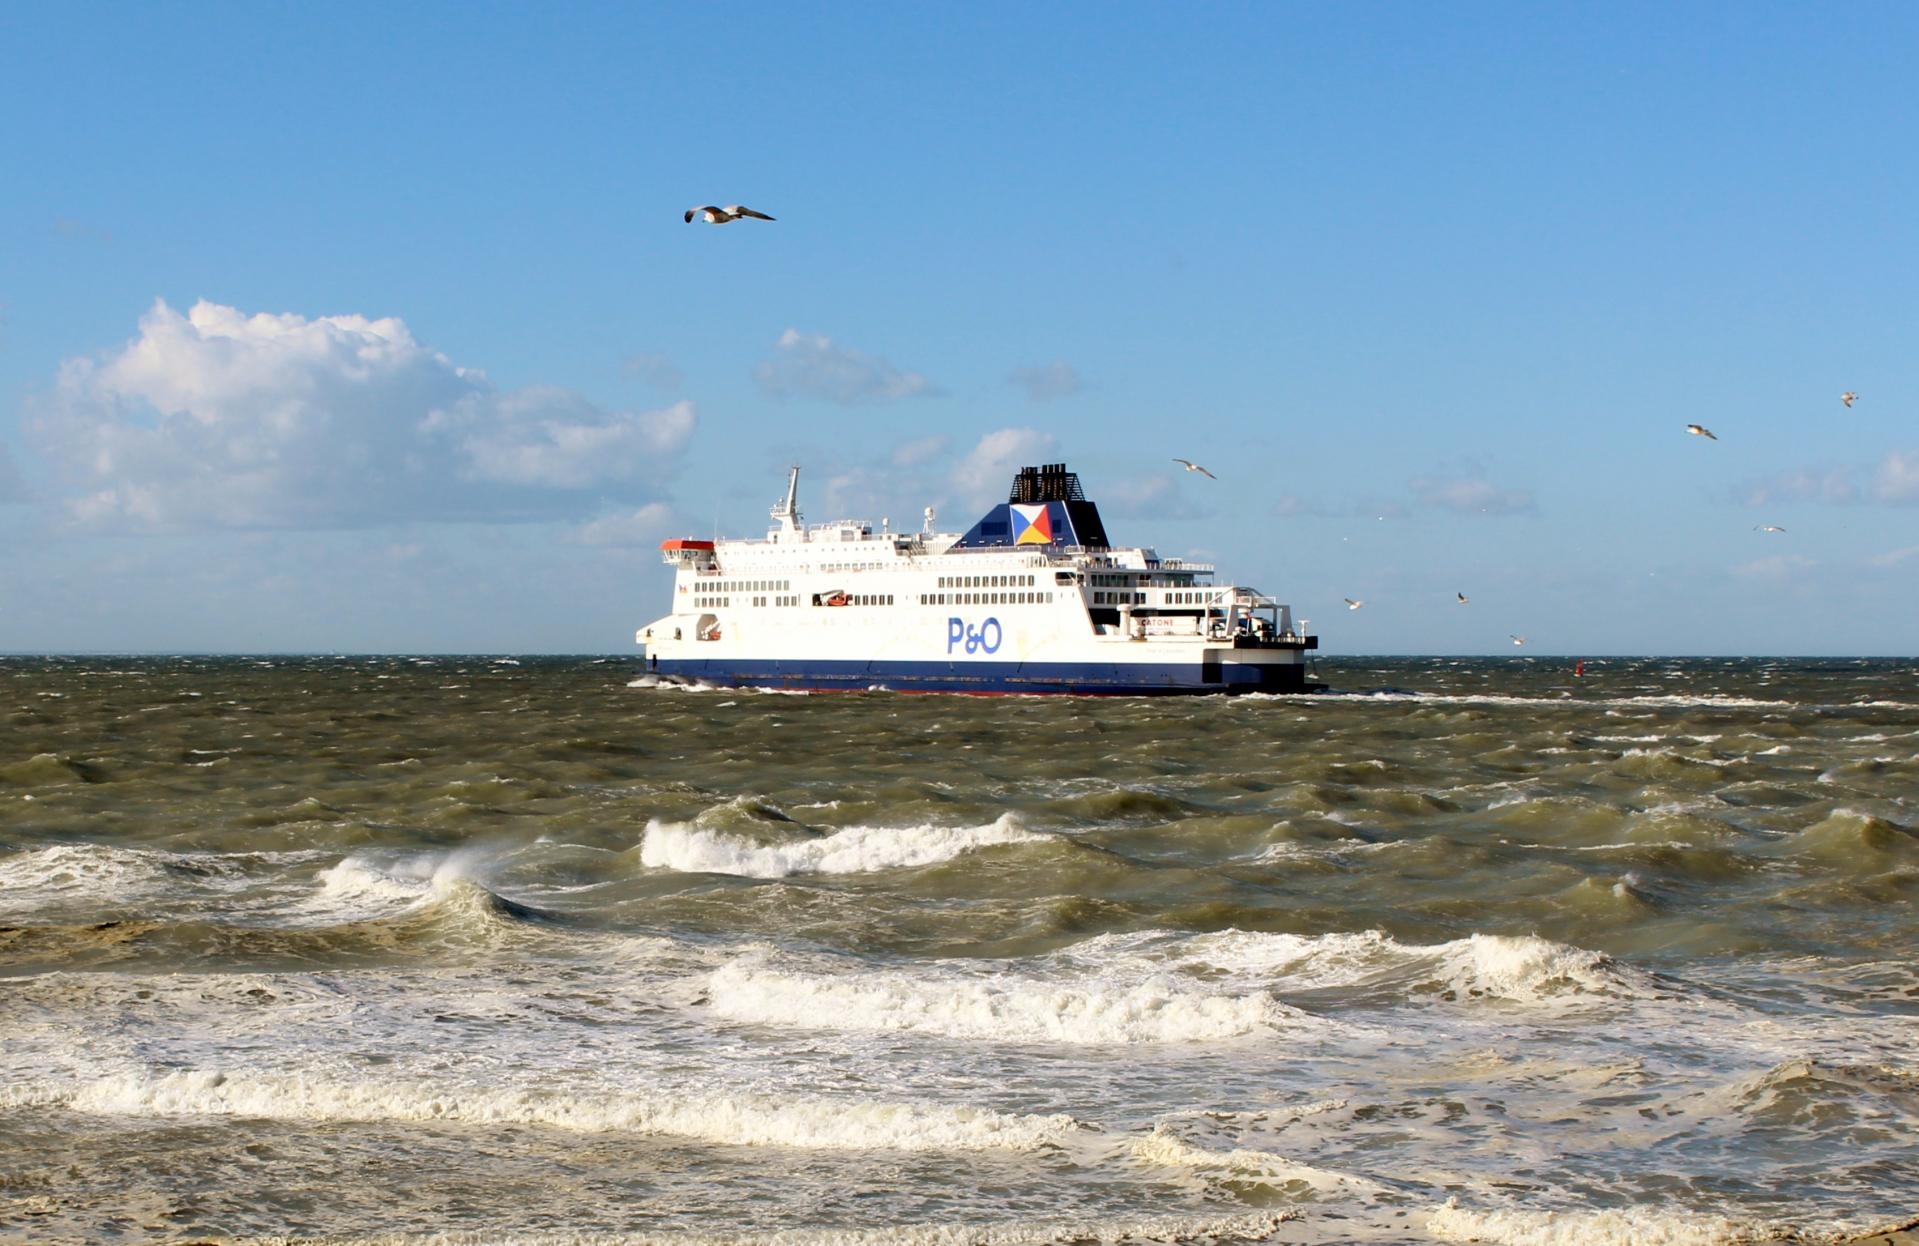 Calais top photo navire et mouette